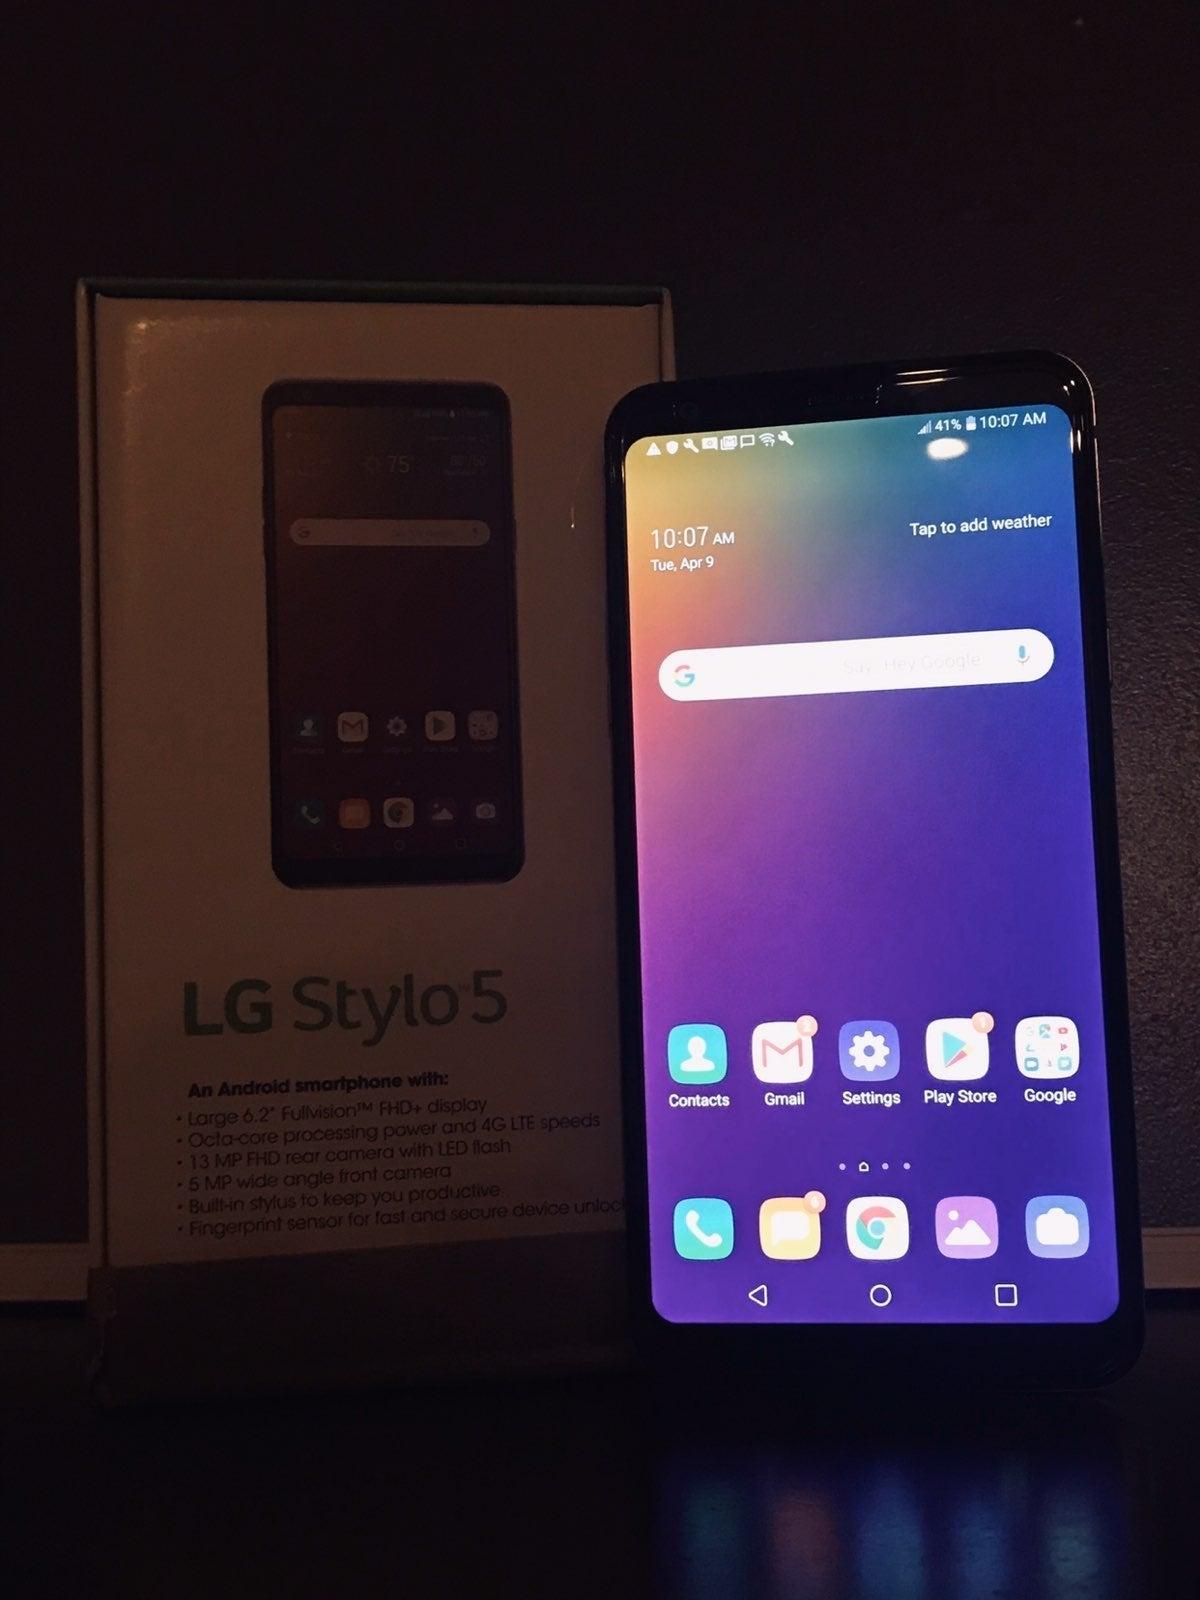 LG Stylo 5, 32GB, Cricket